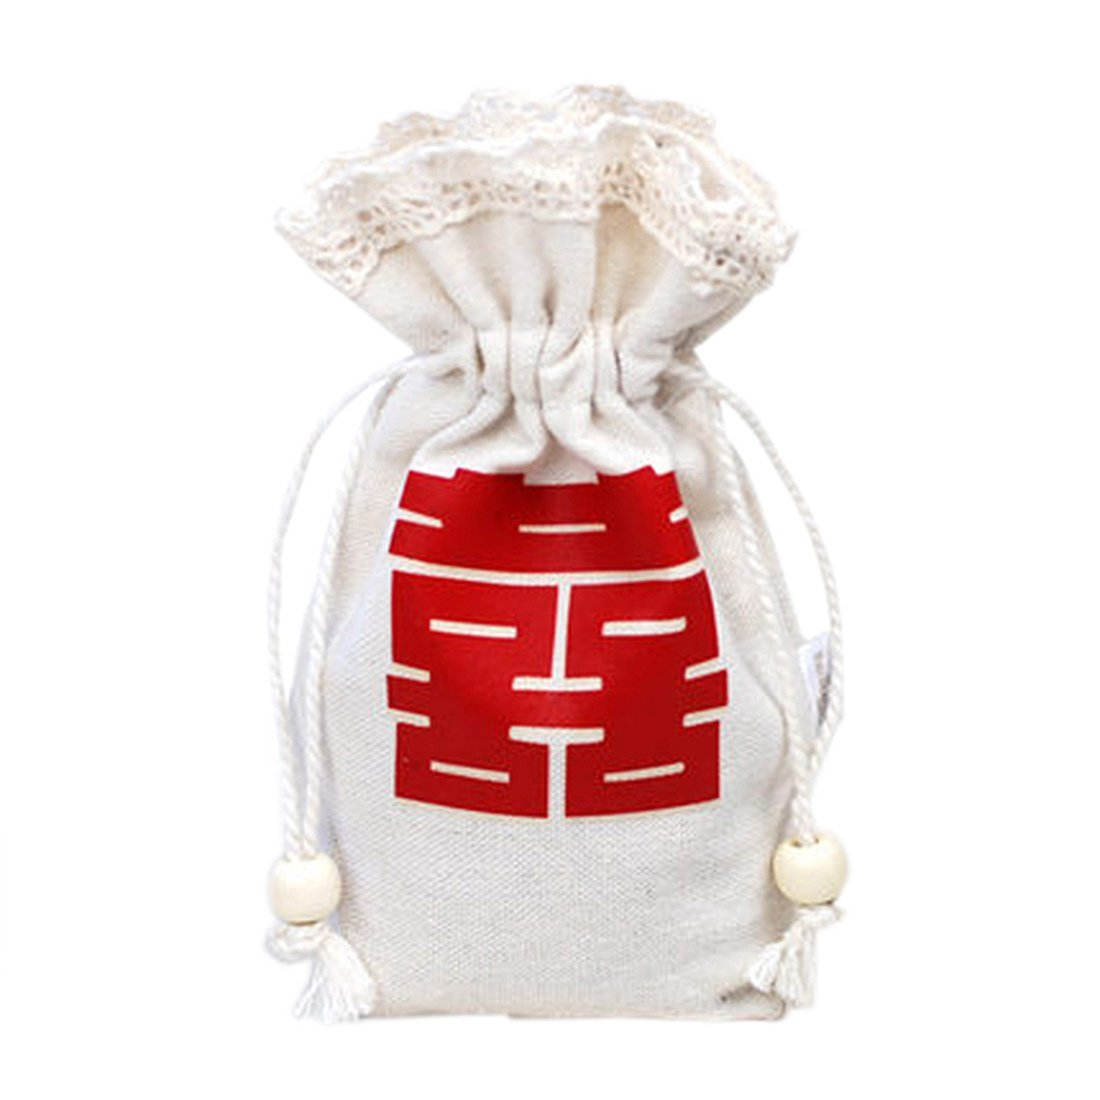 autulet Unique Drawstring Bags Girls Drawstring Bag White Cotton Party Wedding Lace Bags 50Pieces